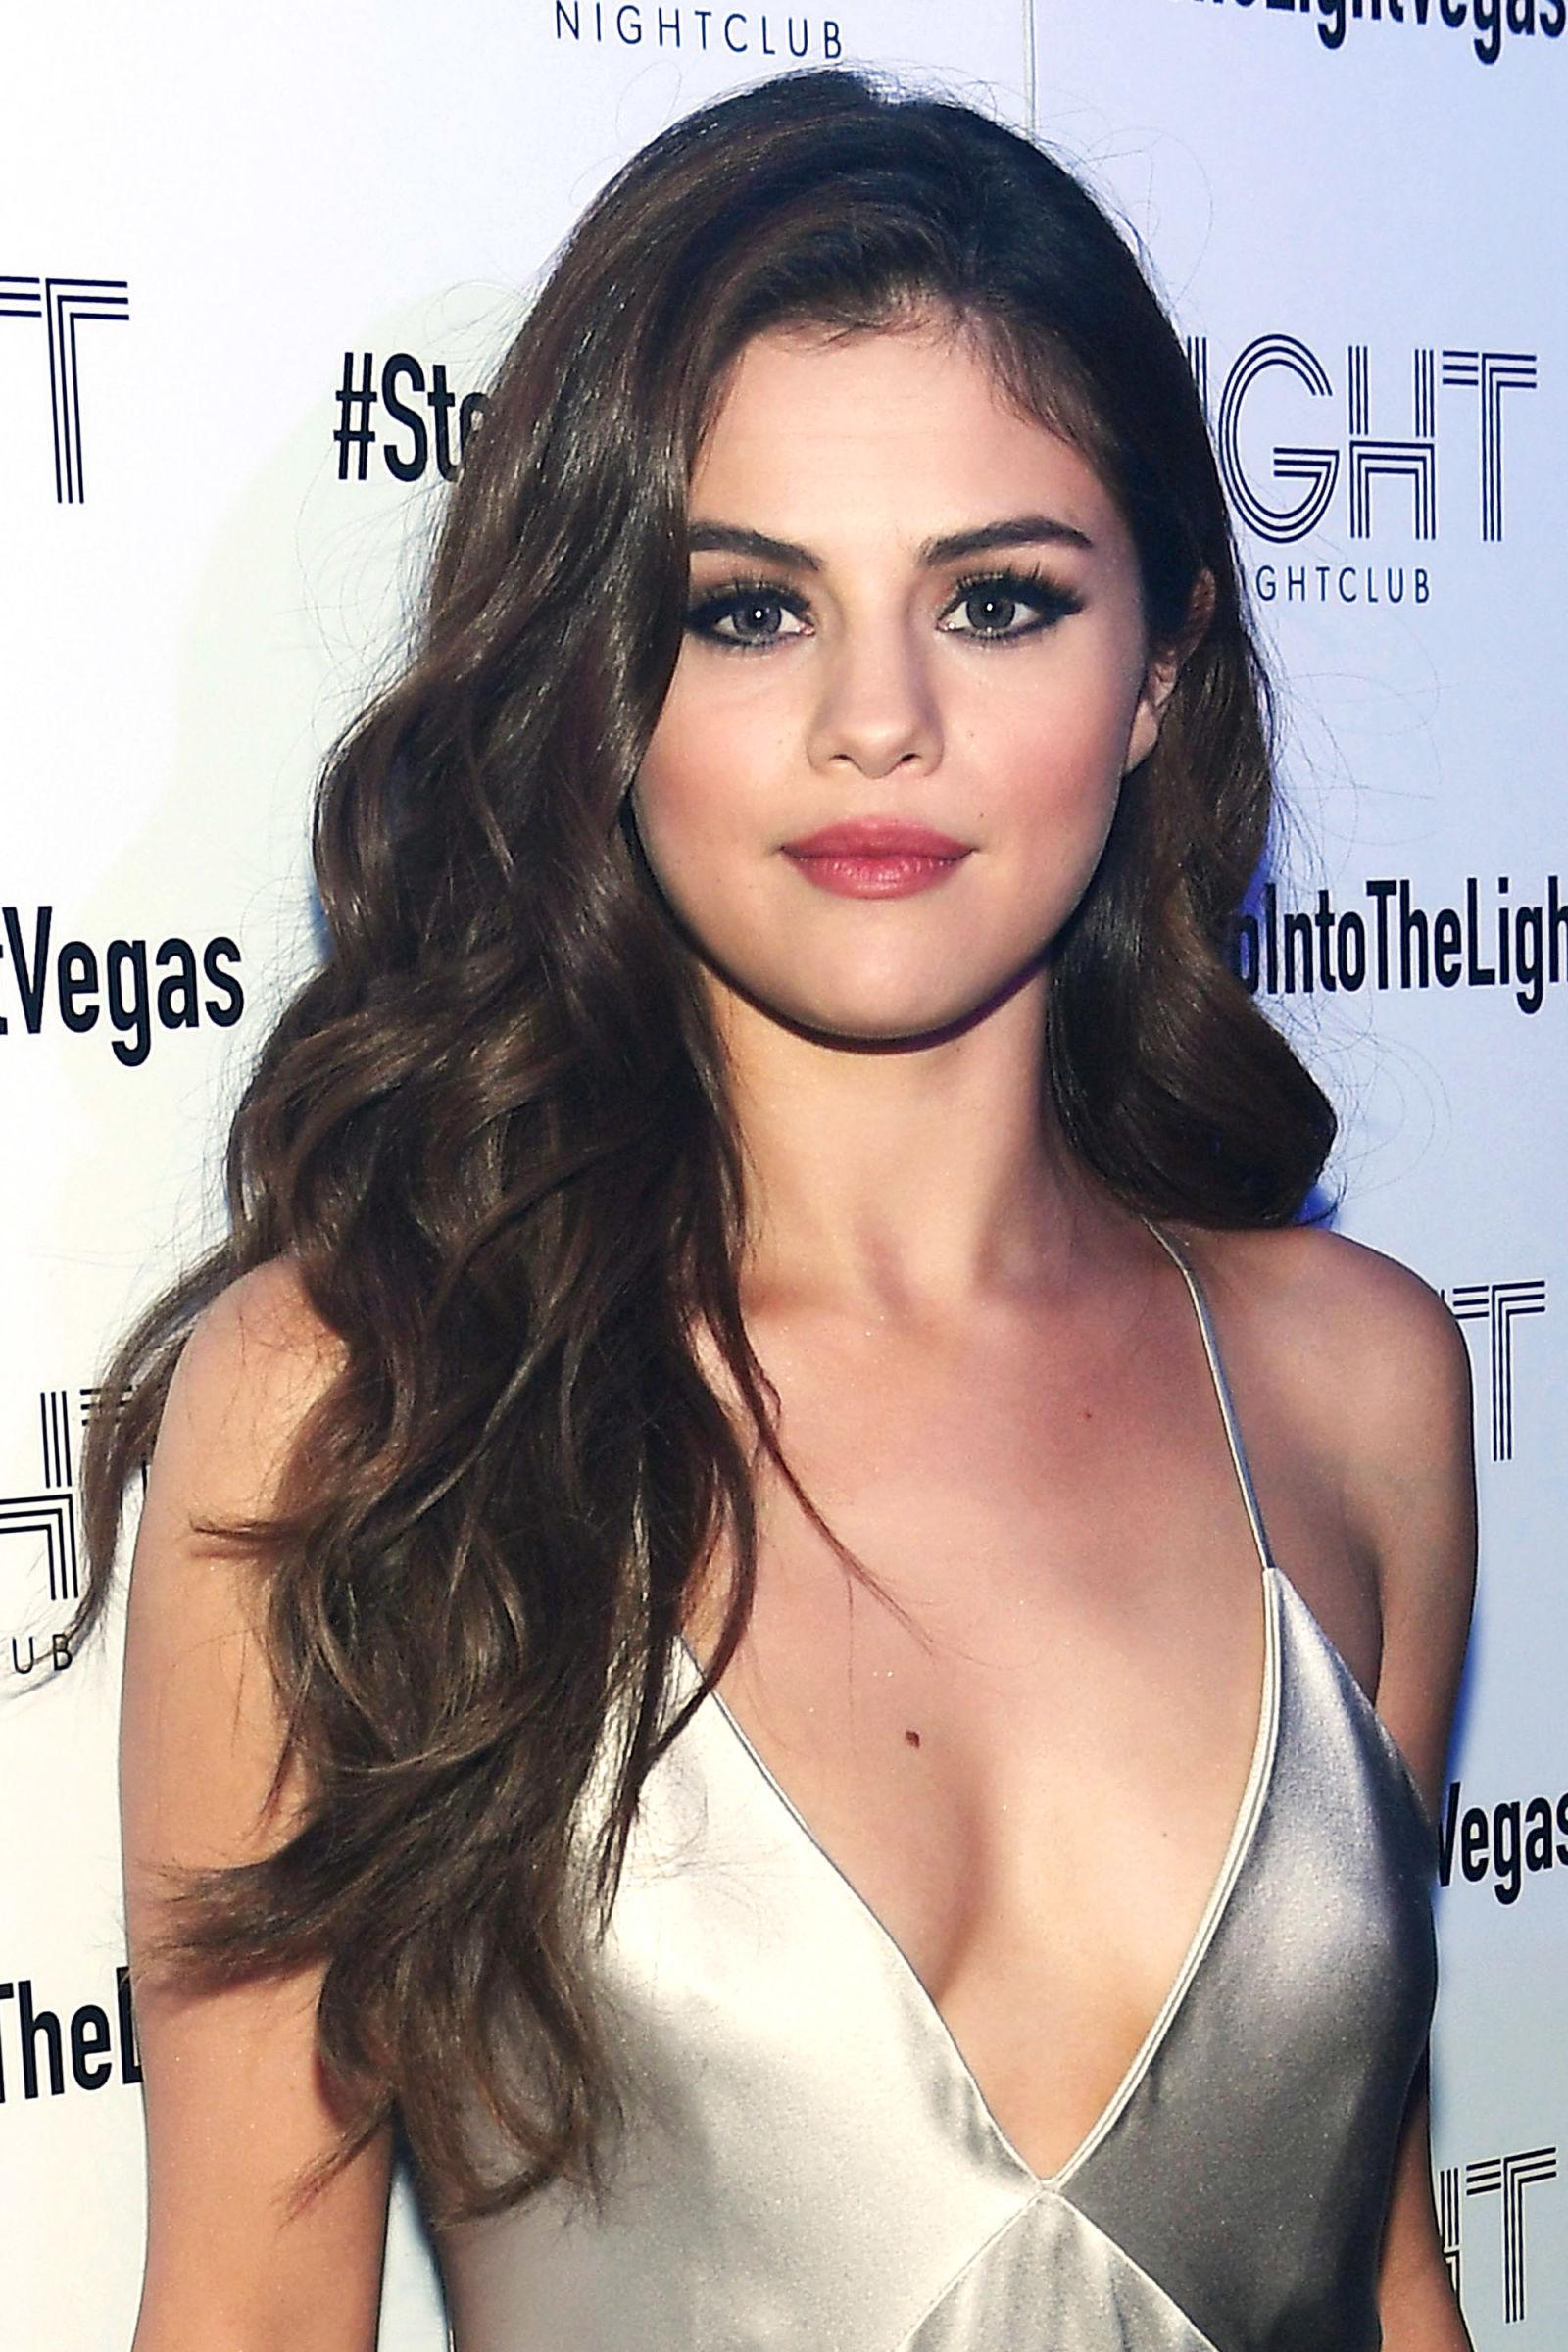 Magnificent Best Selena Gomez Hairstyles 30 Hair Ideas From Selena Gomez Short Hairstyles Gunalazisus